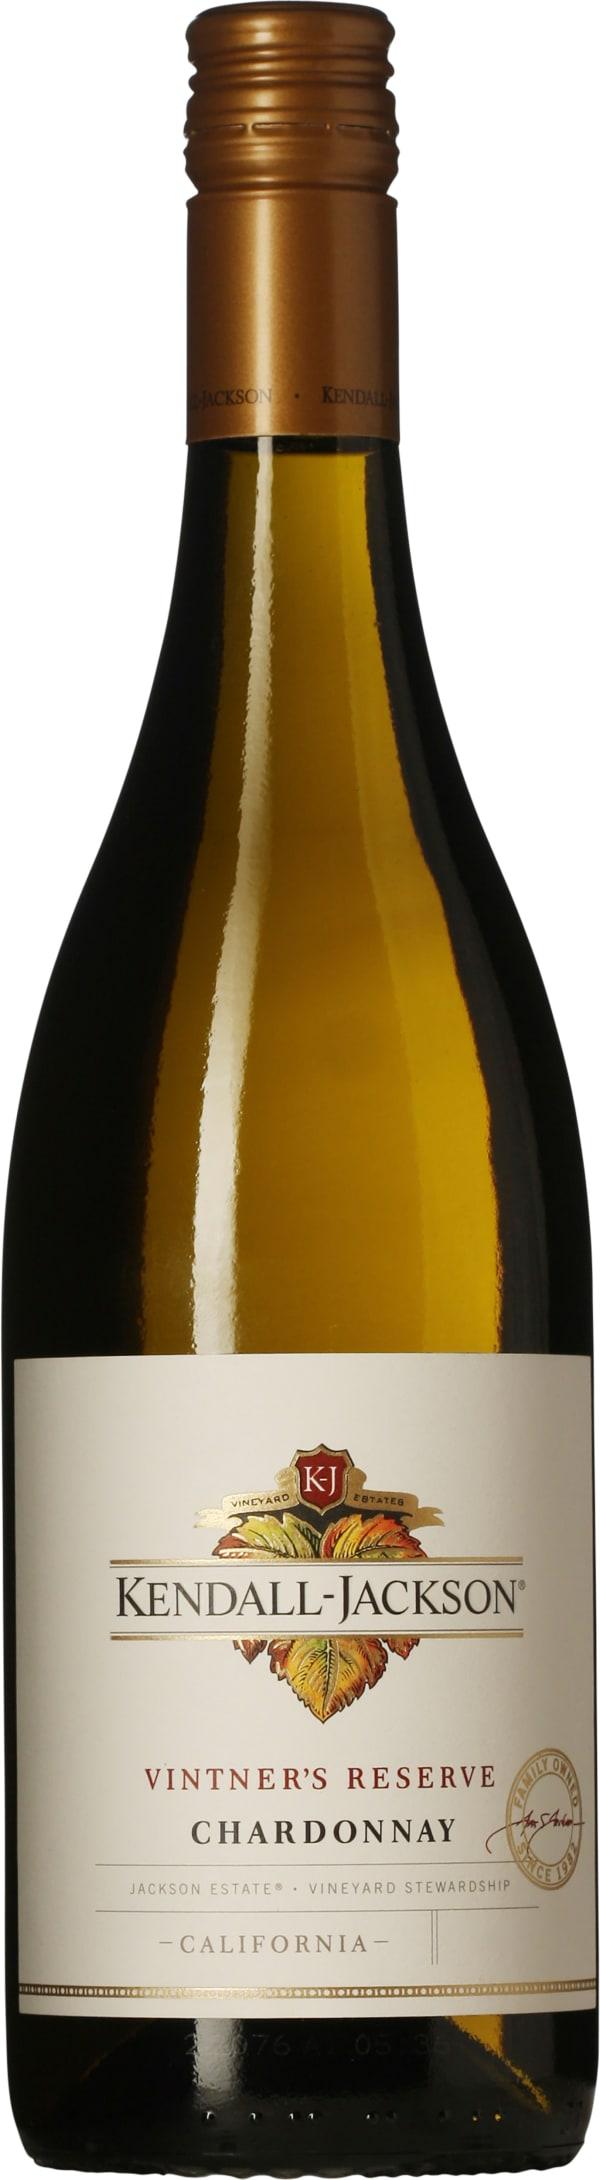 Kendall Jackson Vintner's Reserve Chardonnay 2016